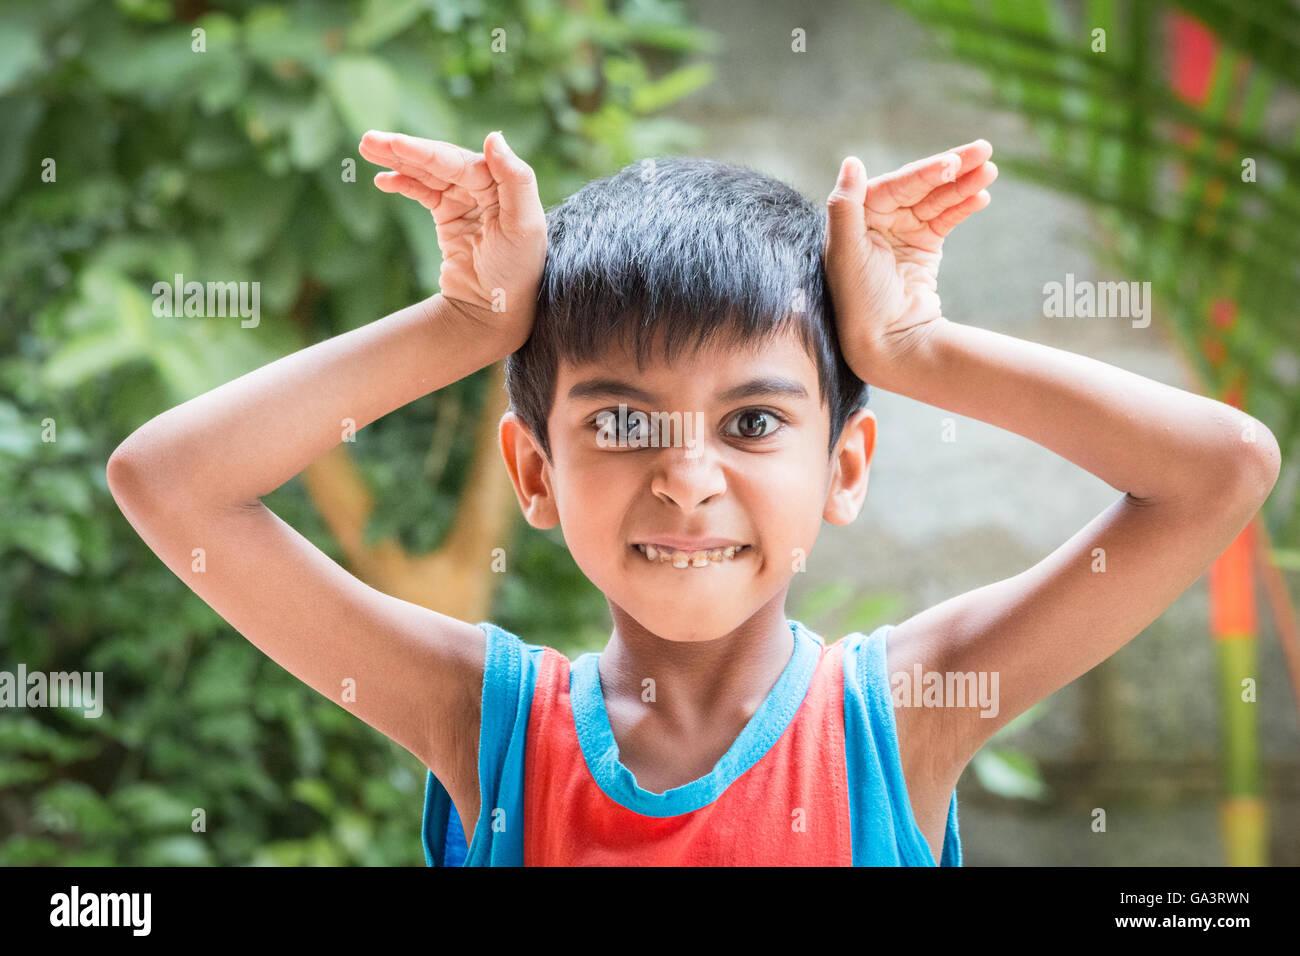 Kid showing emotion of anger, surprise, rage, distress - Stock Image